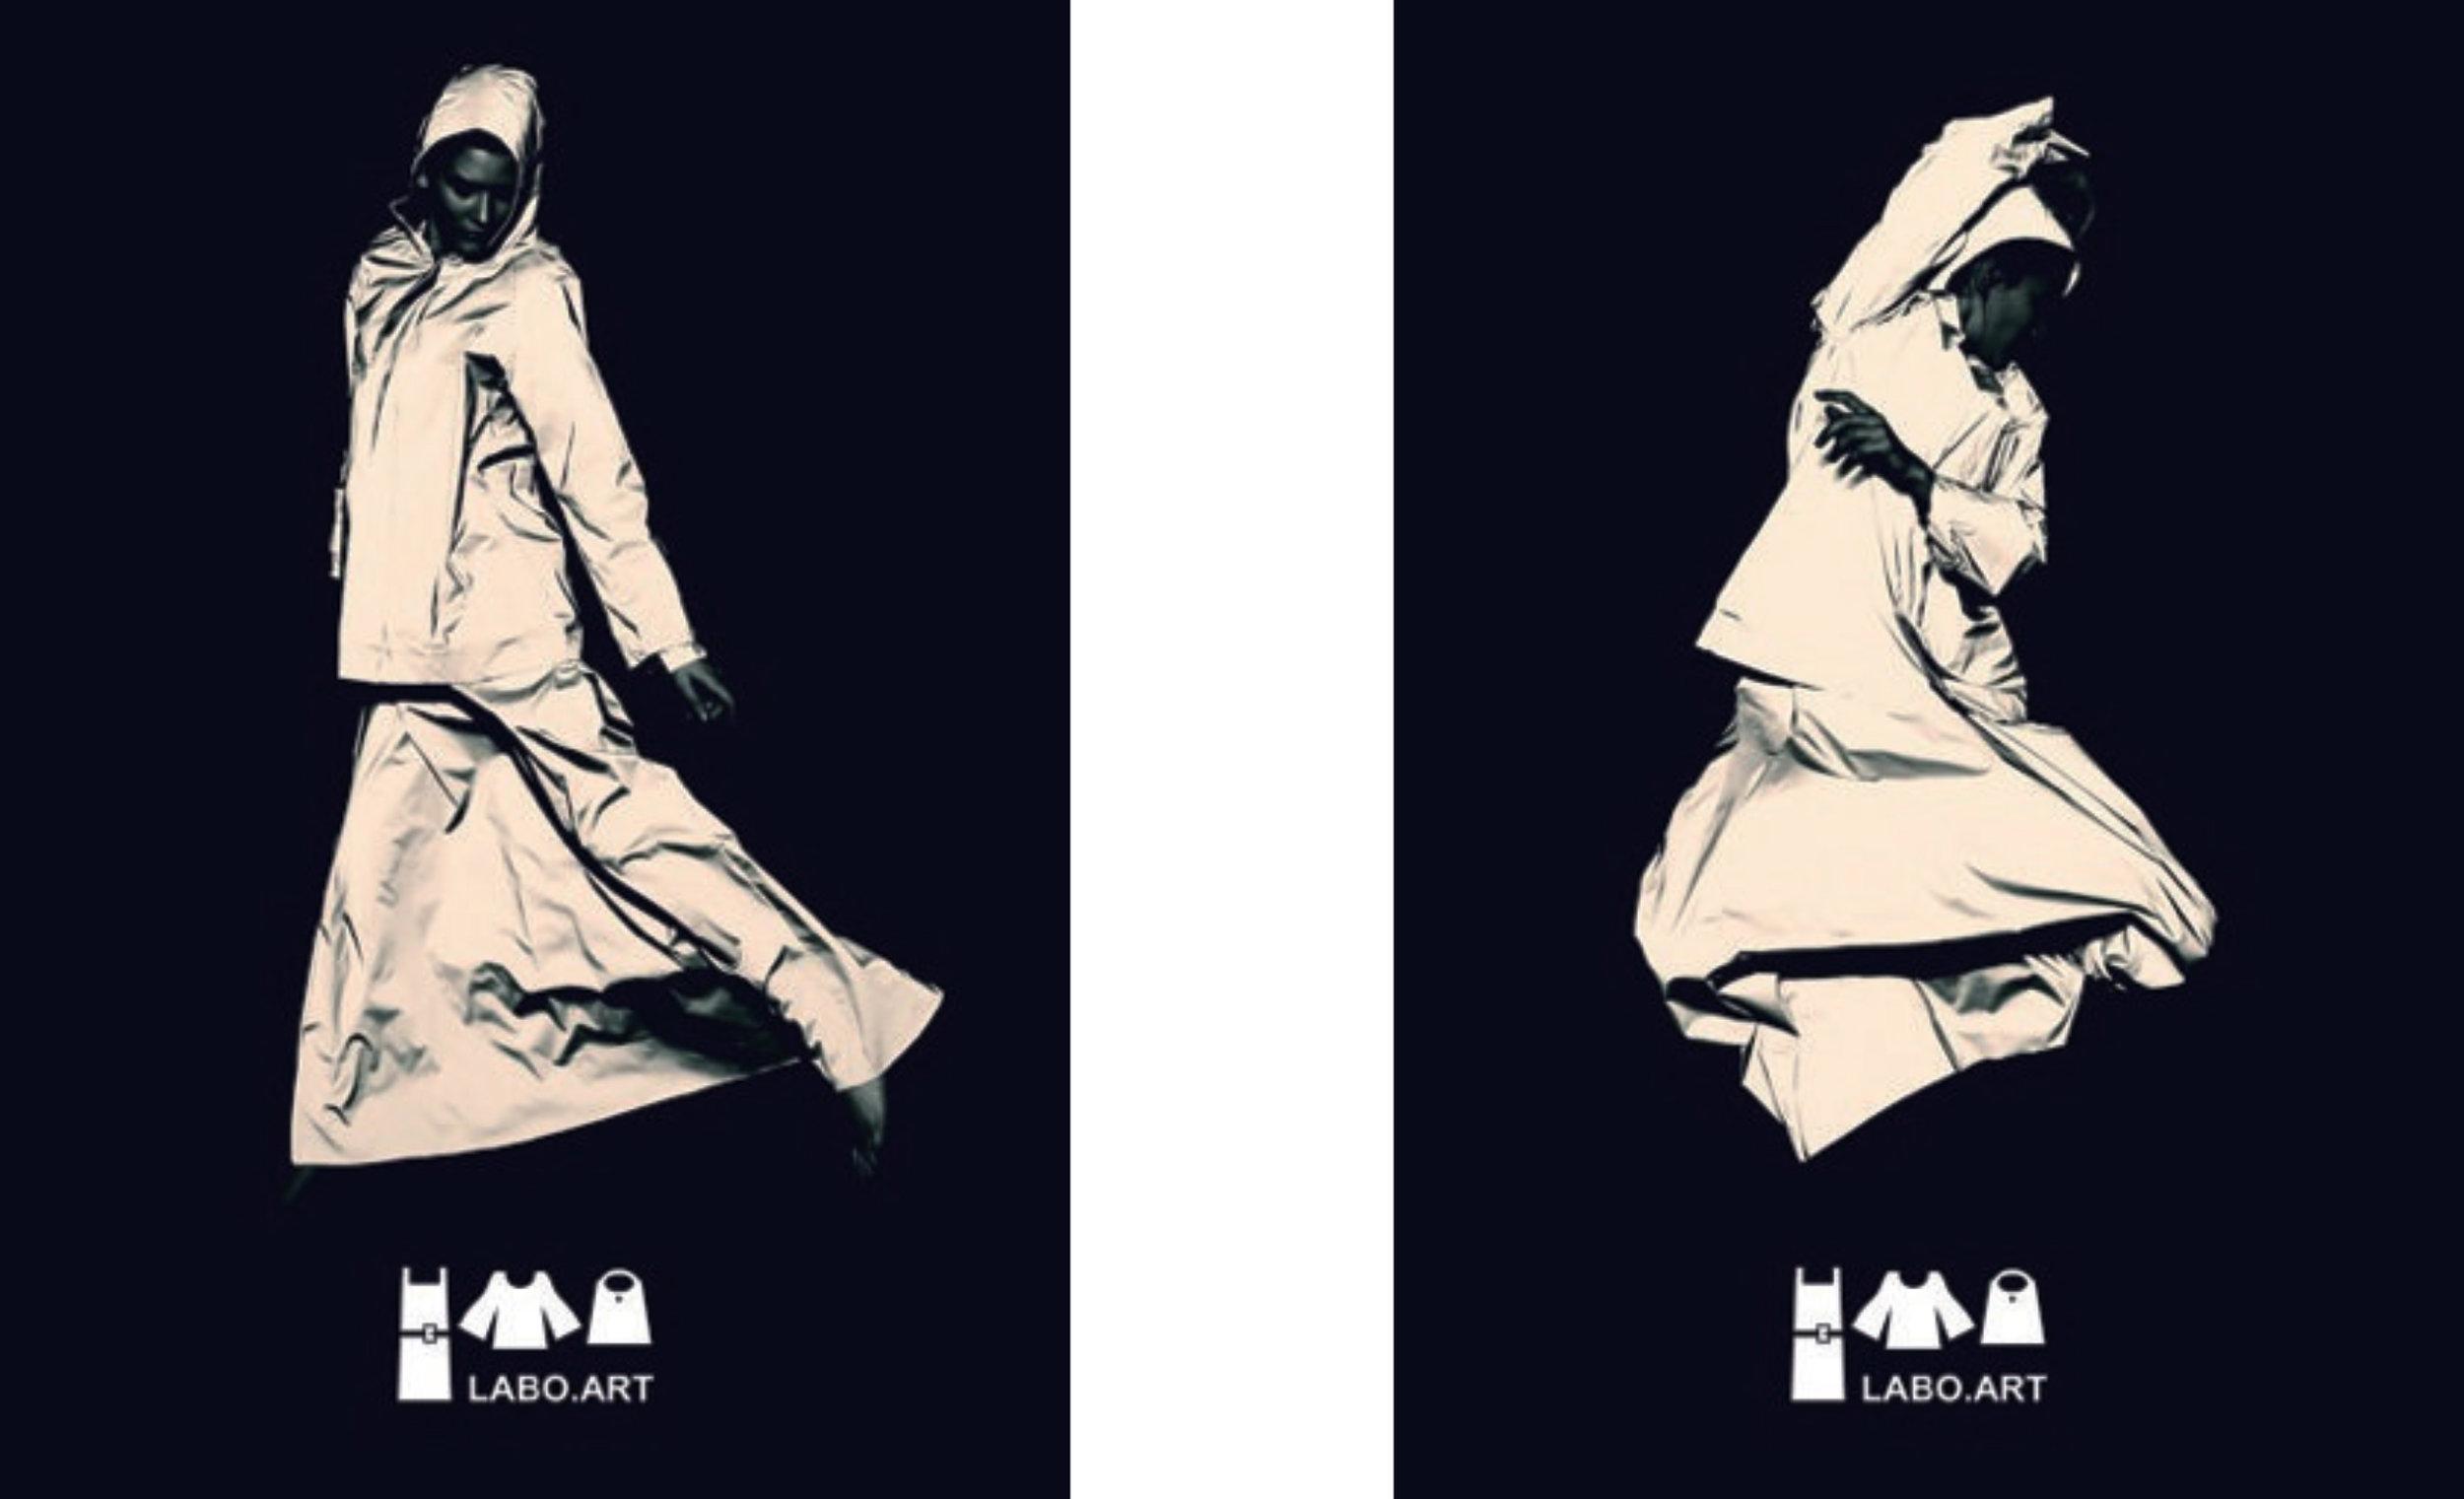 LABO.ART -